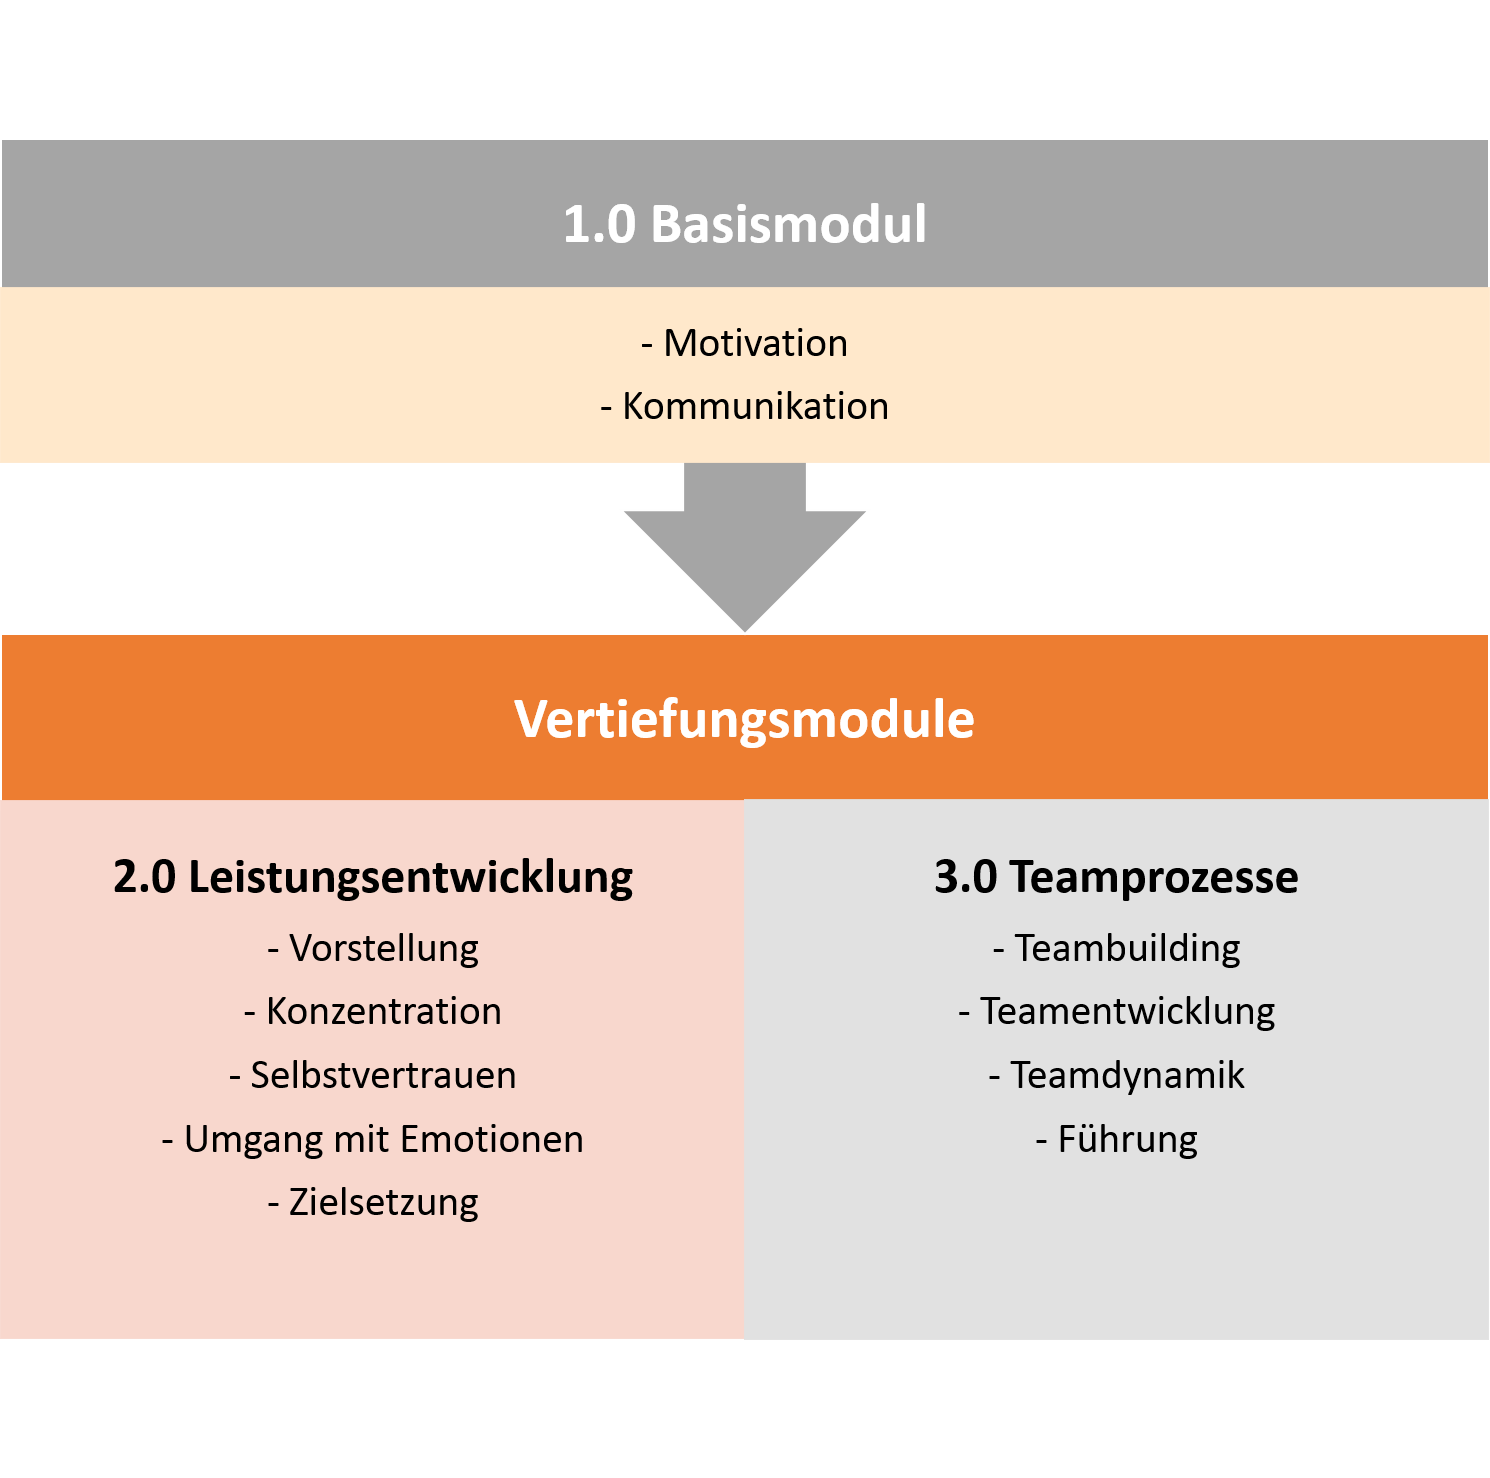 erklaerung-zertifikatsystem.text.image2